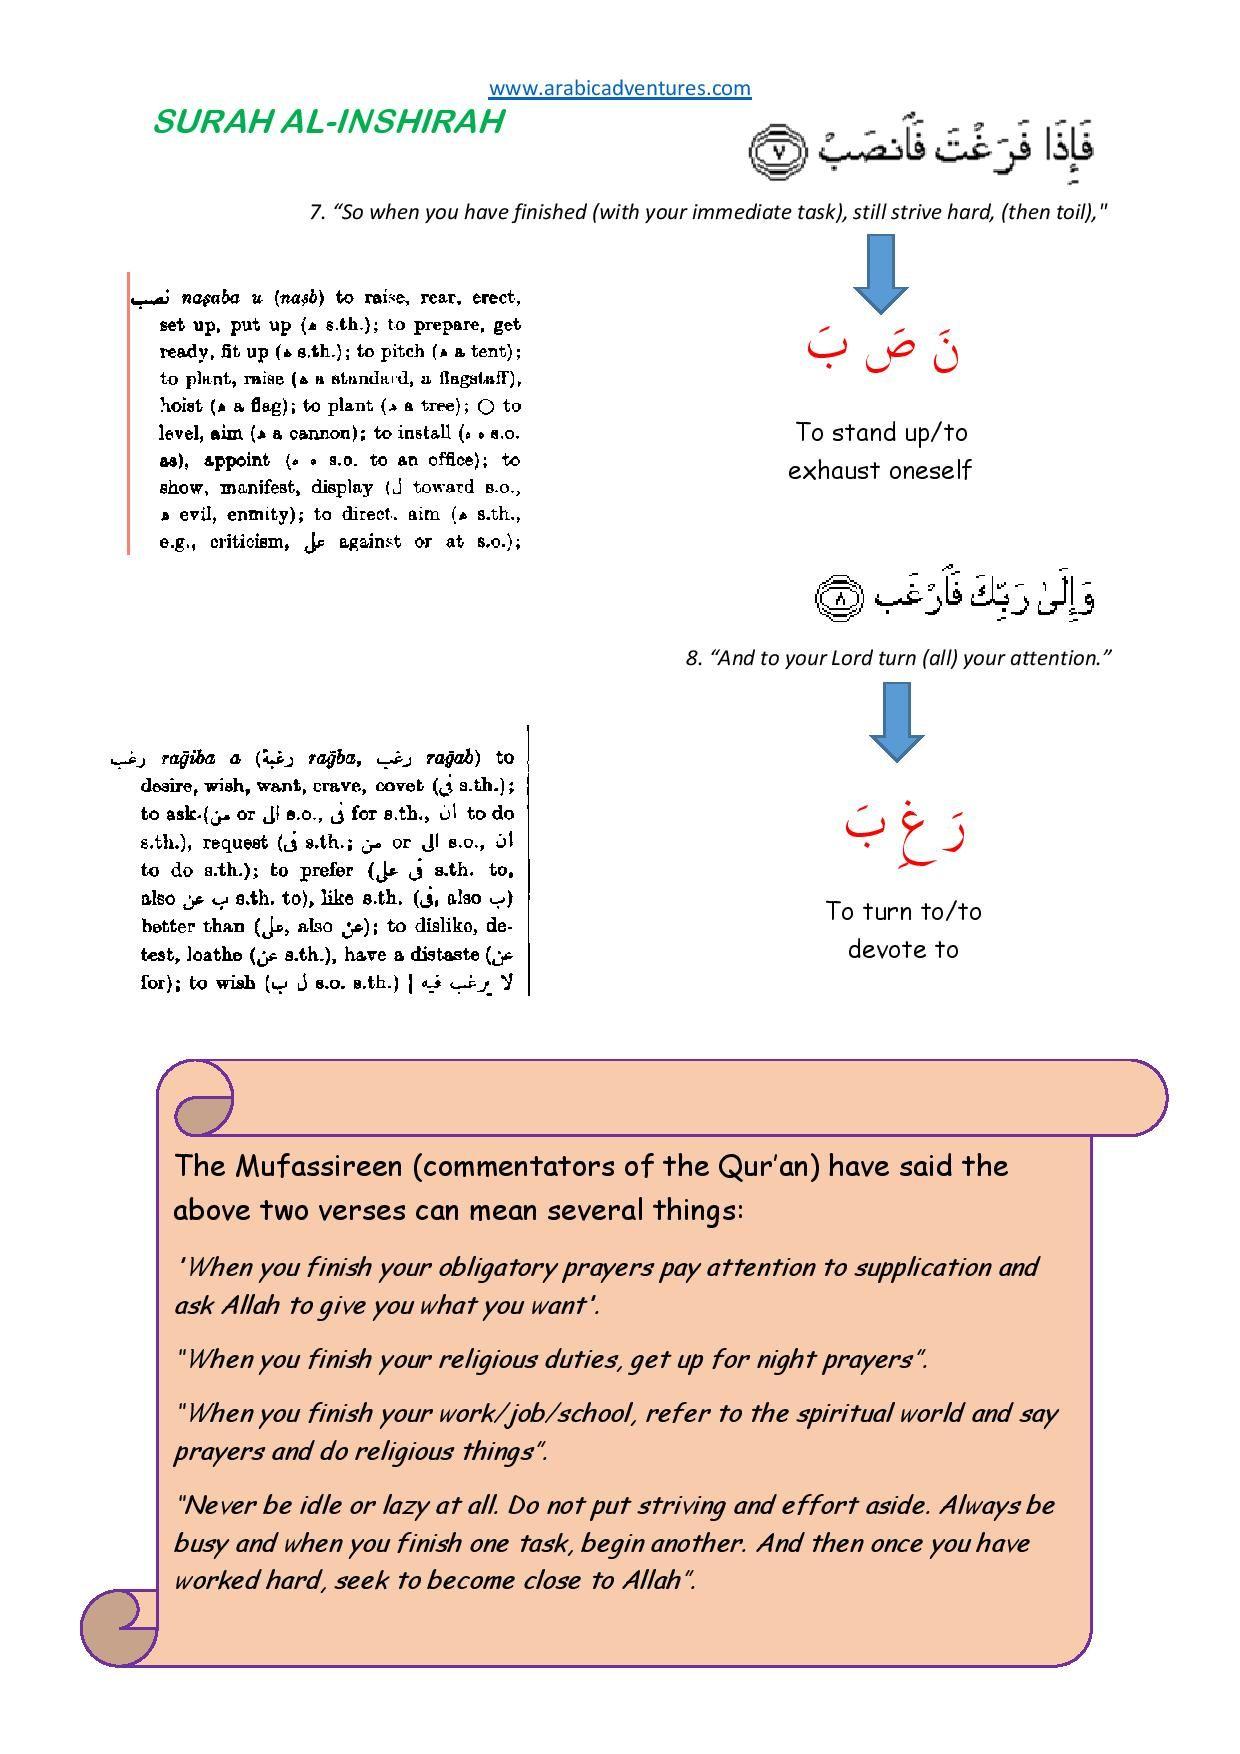 Surah Al Inshirah Tafsir Handout 1 Free At